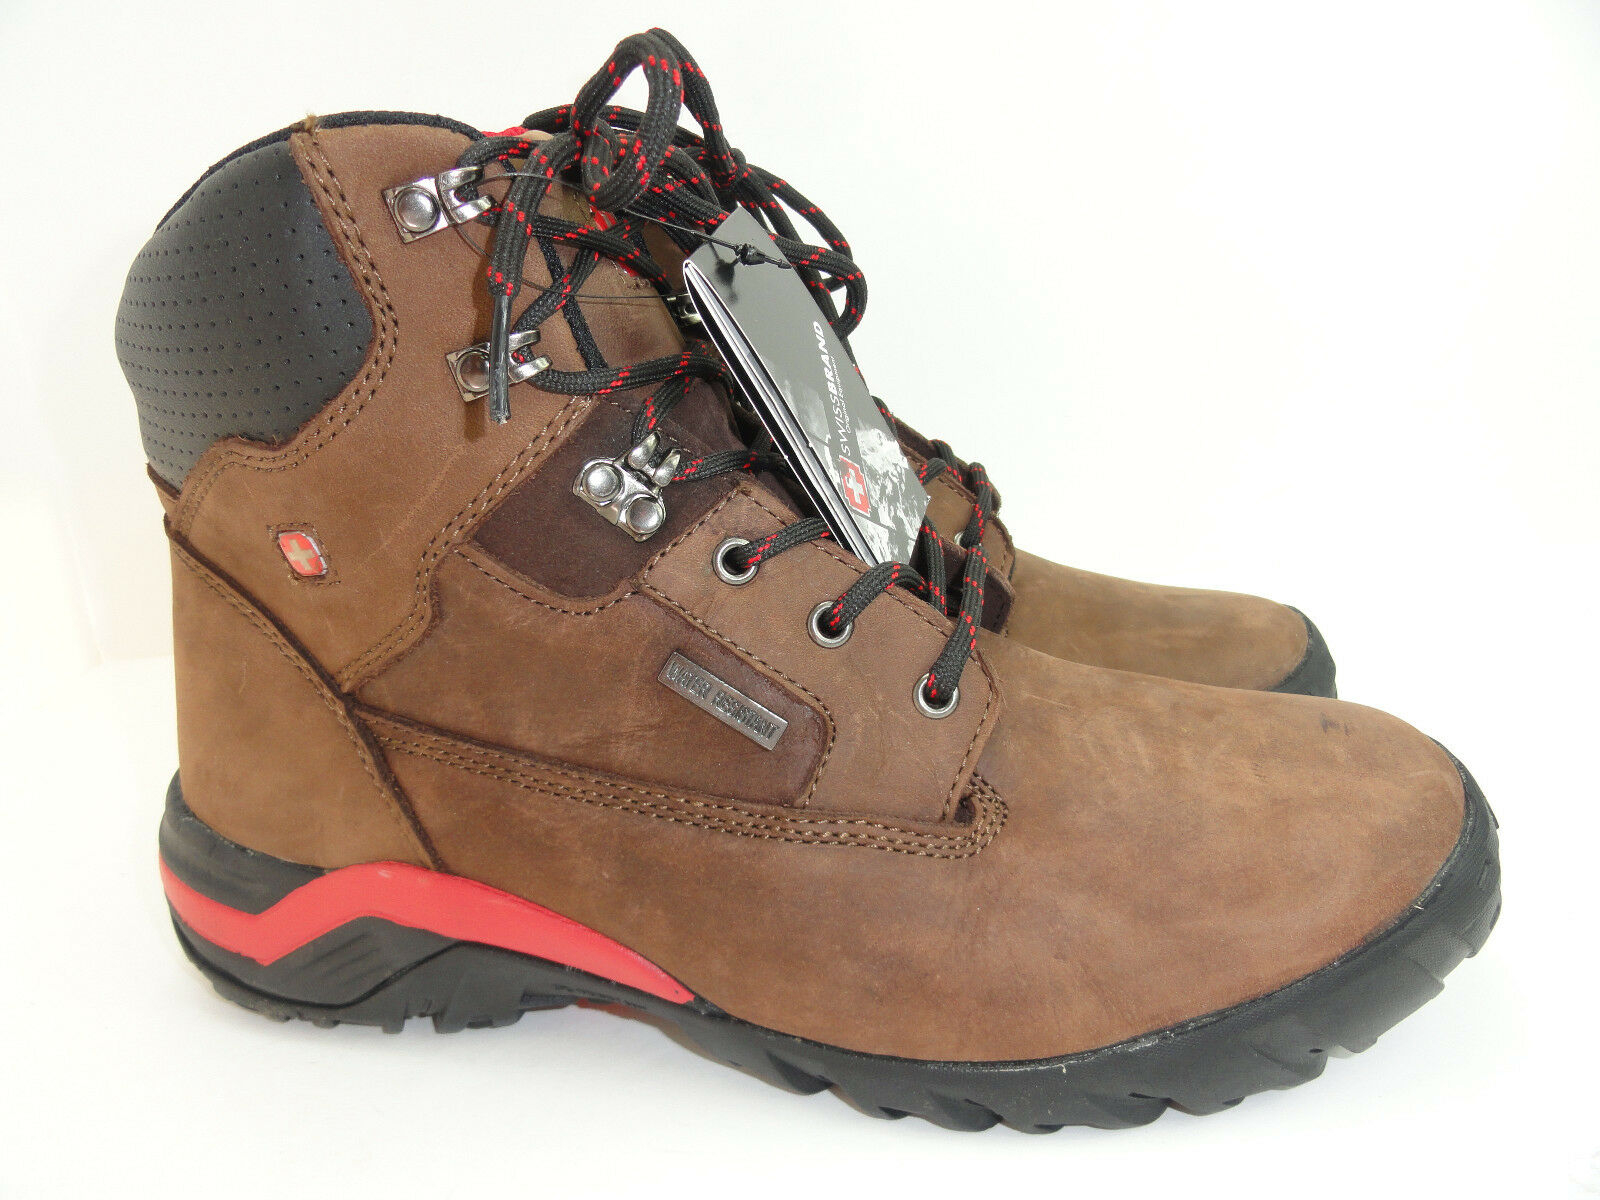 Swissbrand Women's Drumsen Water Resistant HikingTrail Brown Boots Size 11